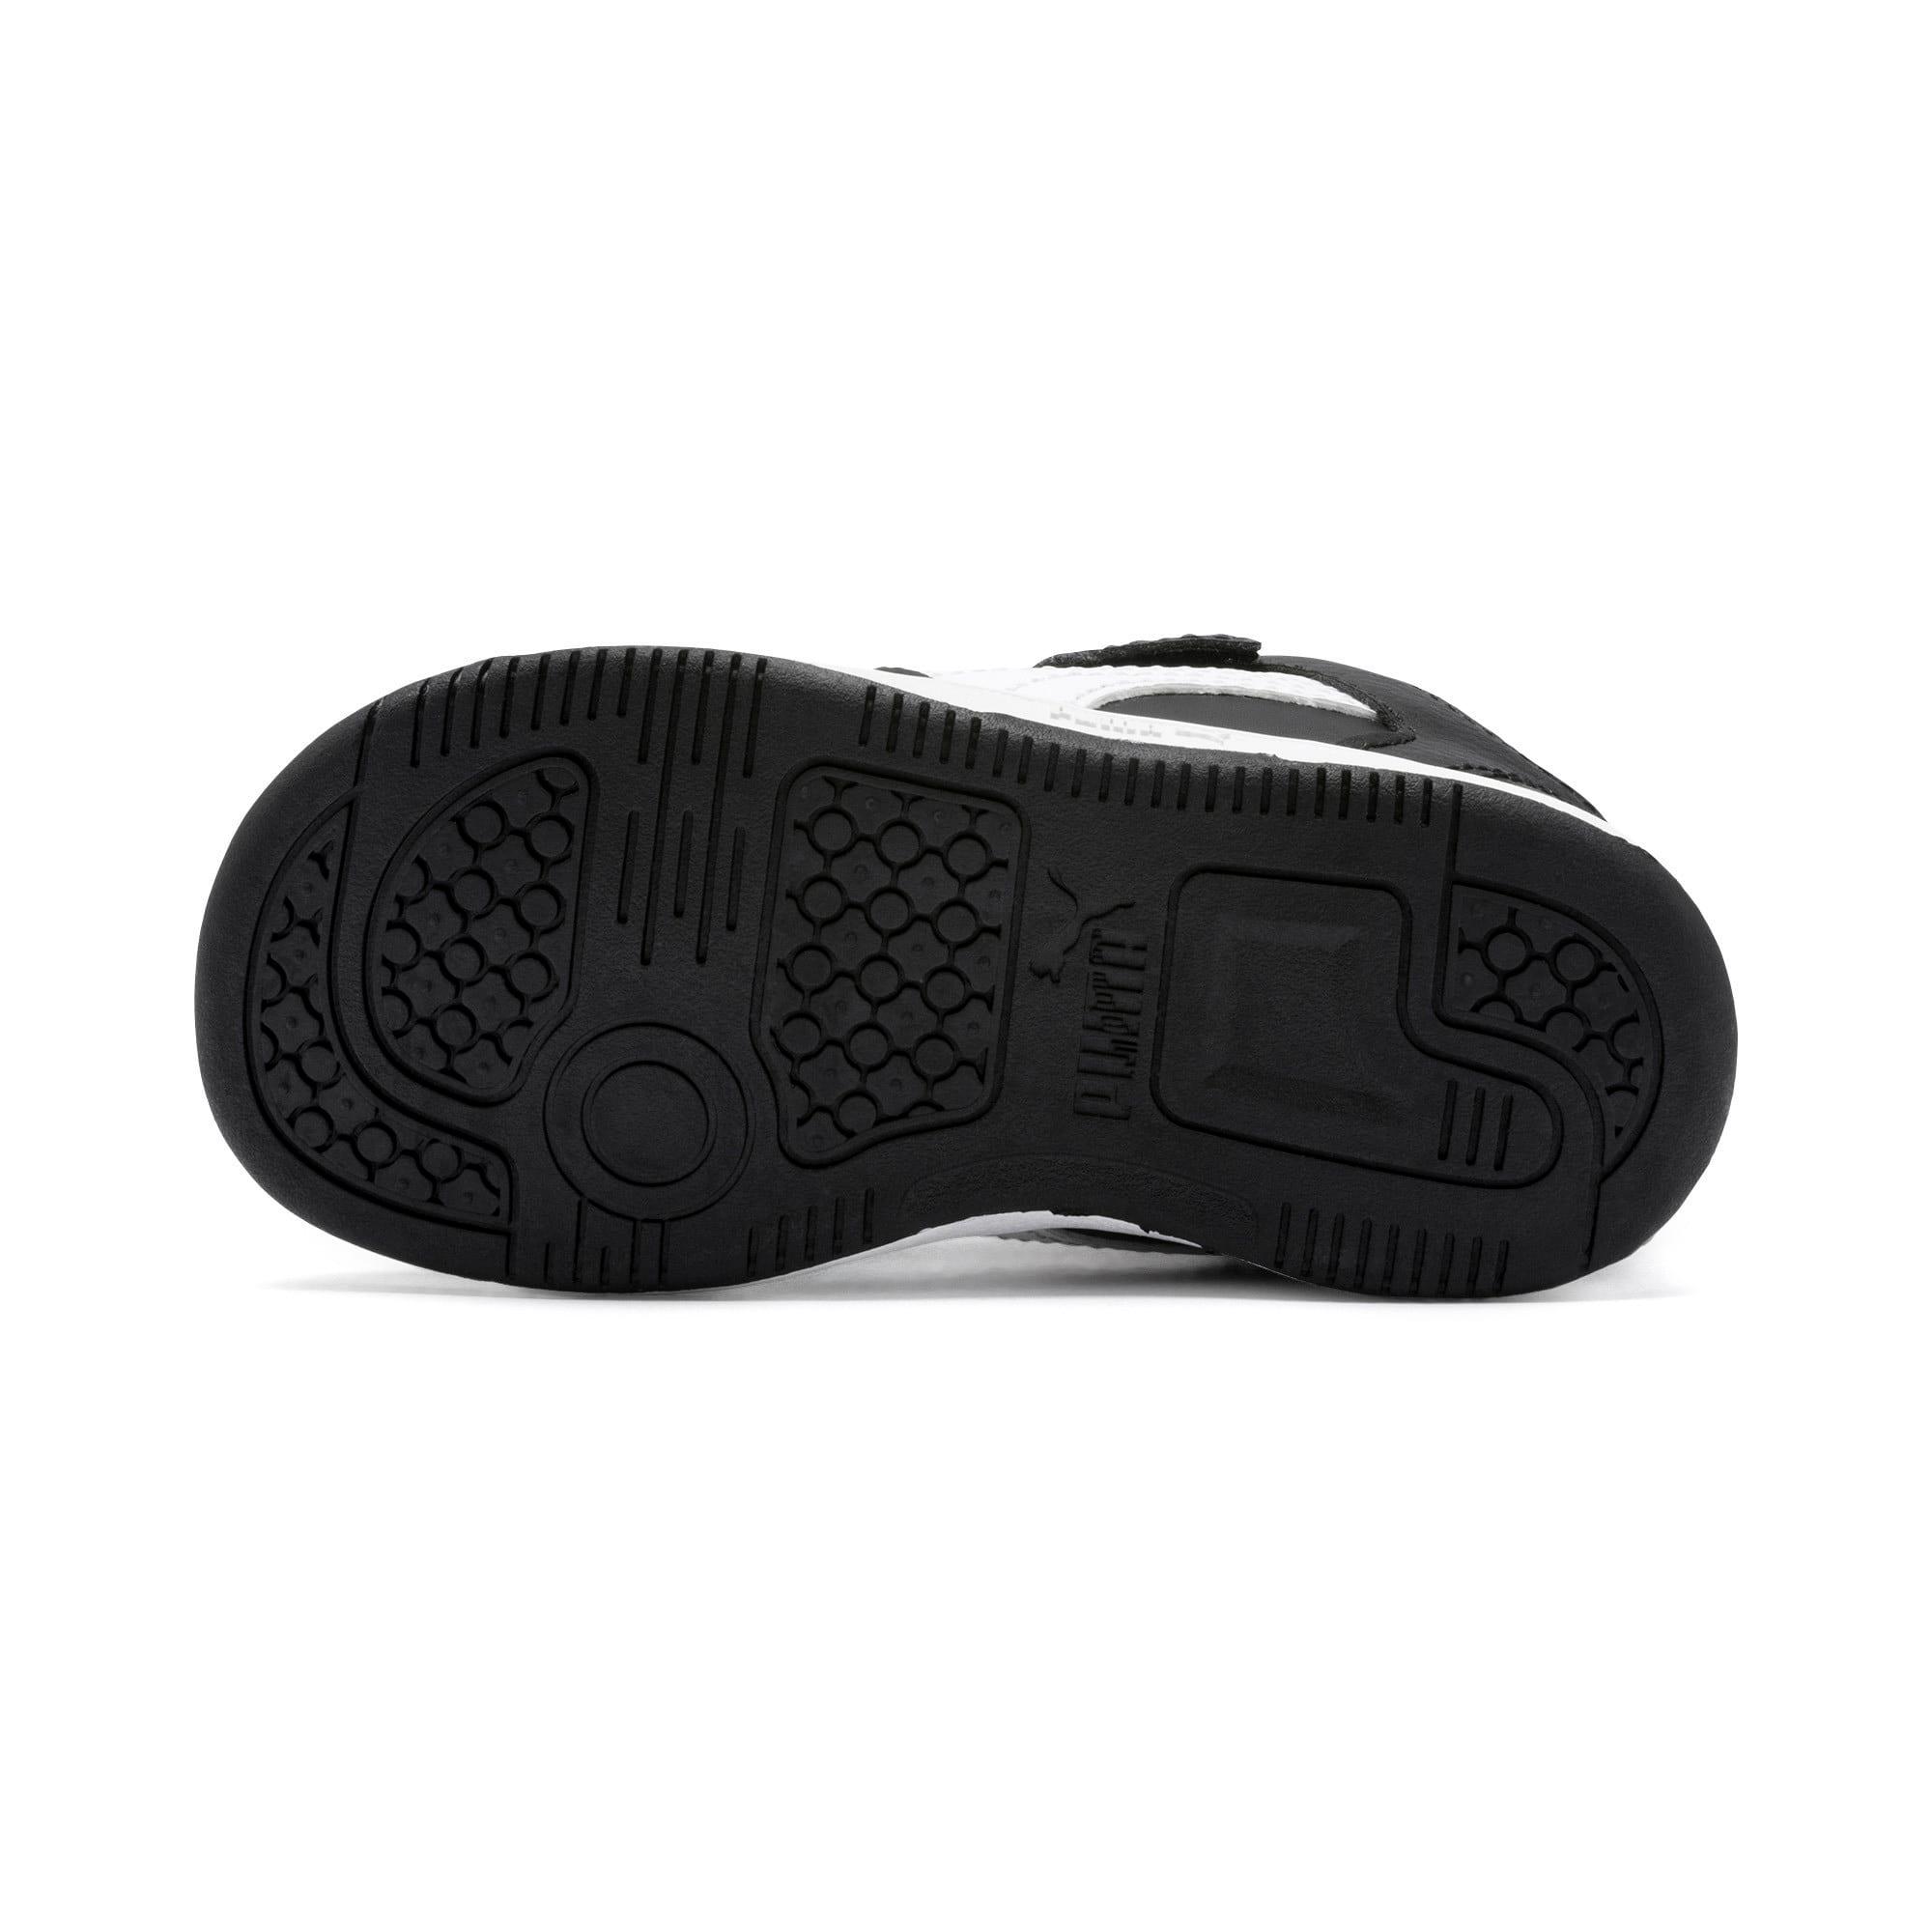 Miniatura 4 de Zapatos deportivos PUMA Rebound LayUp Lo para INF, Puma Black-Blanco-High Rise, mediano